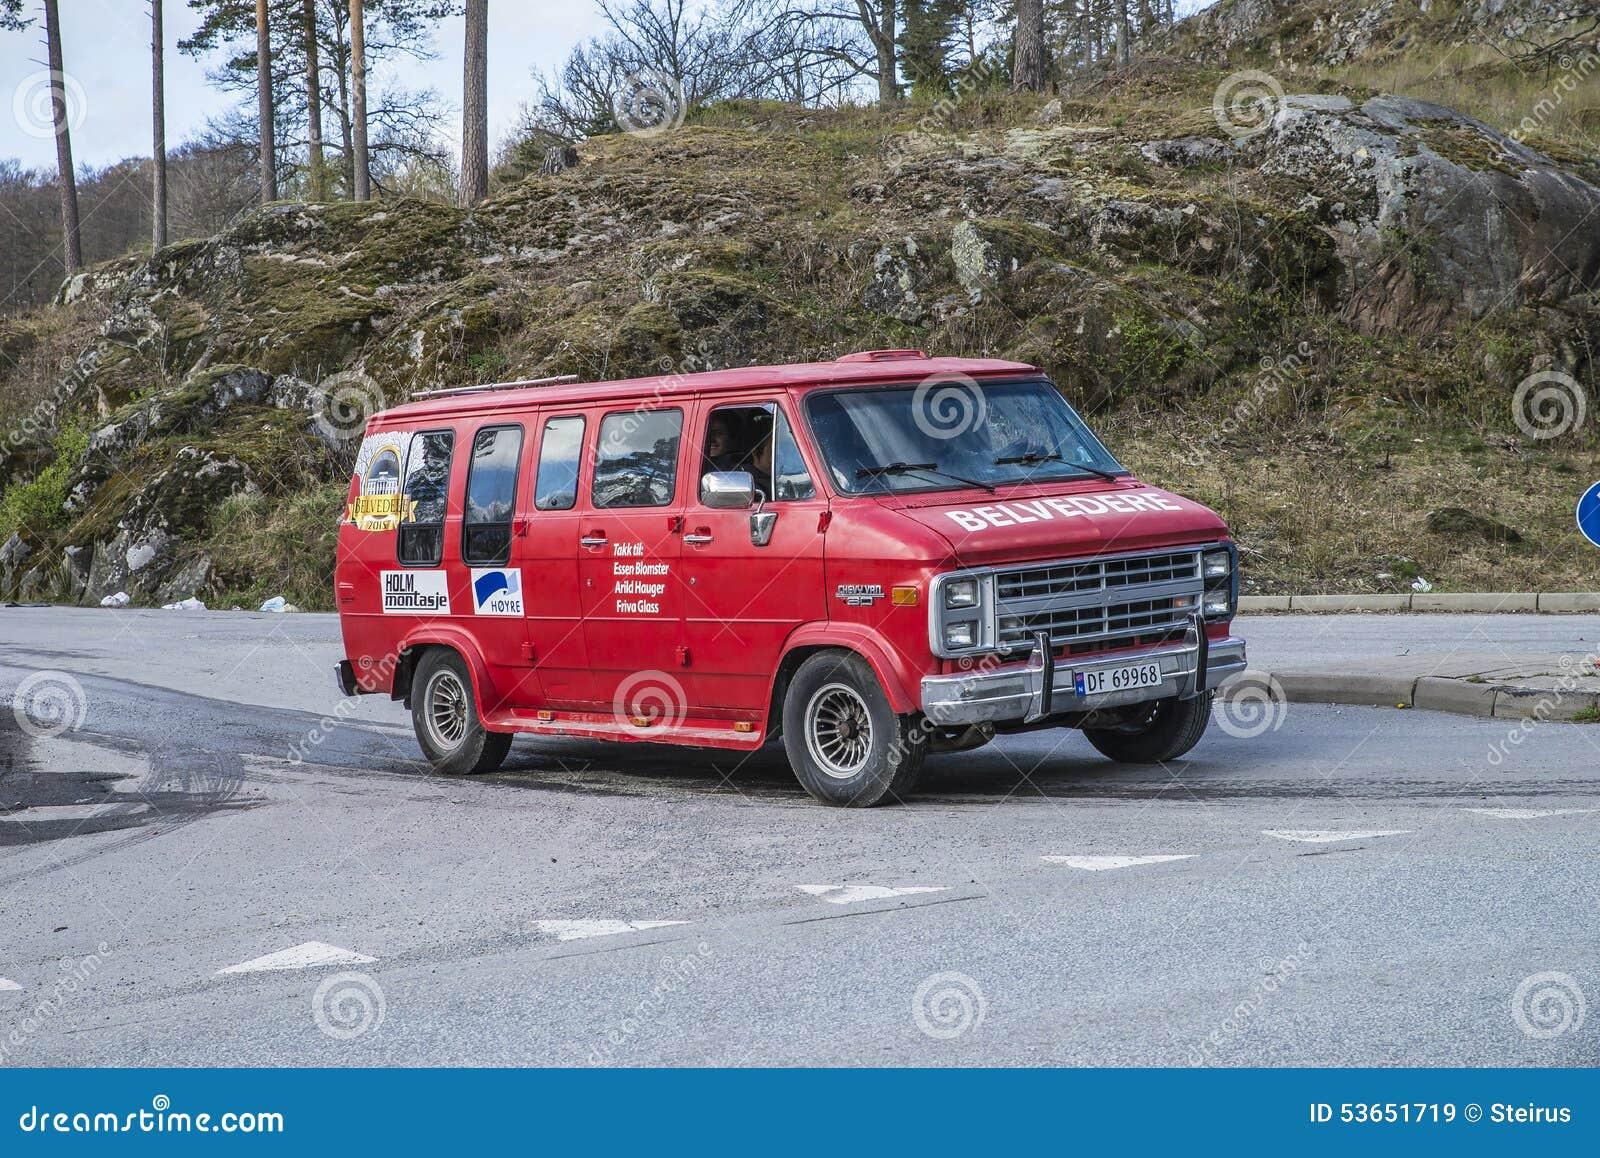 Russe会议(见面的国家)在Fredriksten堡垒2015年(Russe车)